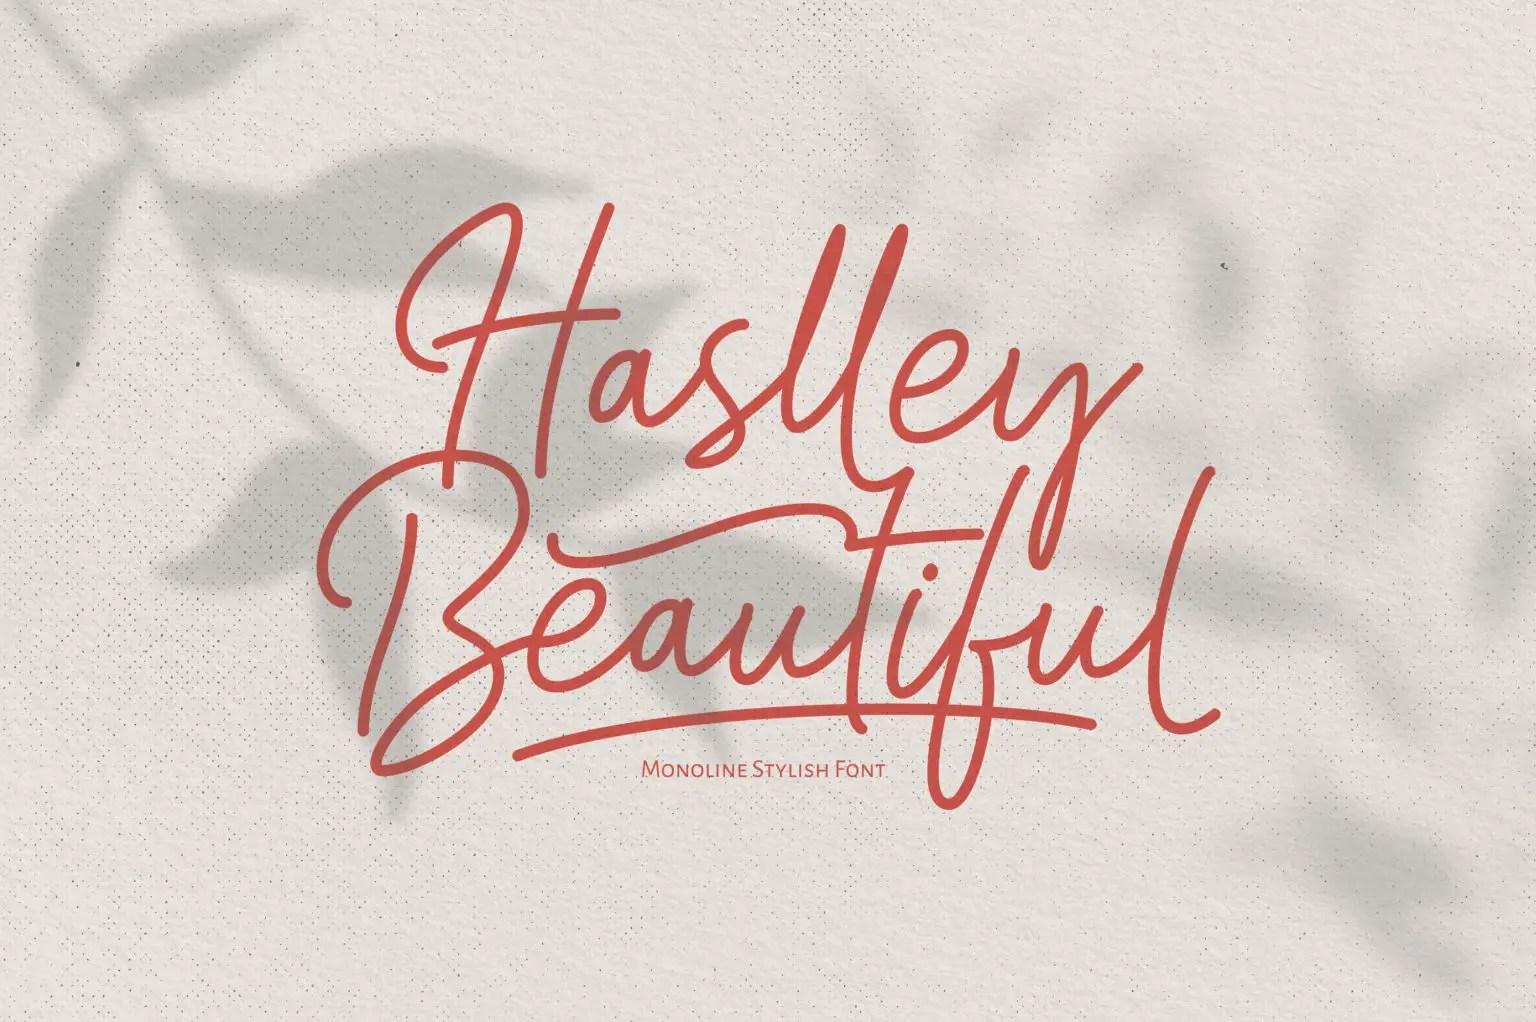 Haslley Beautiful Calligraphy Script Font-1